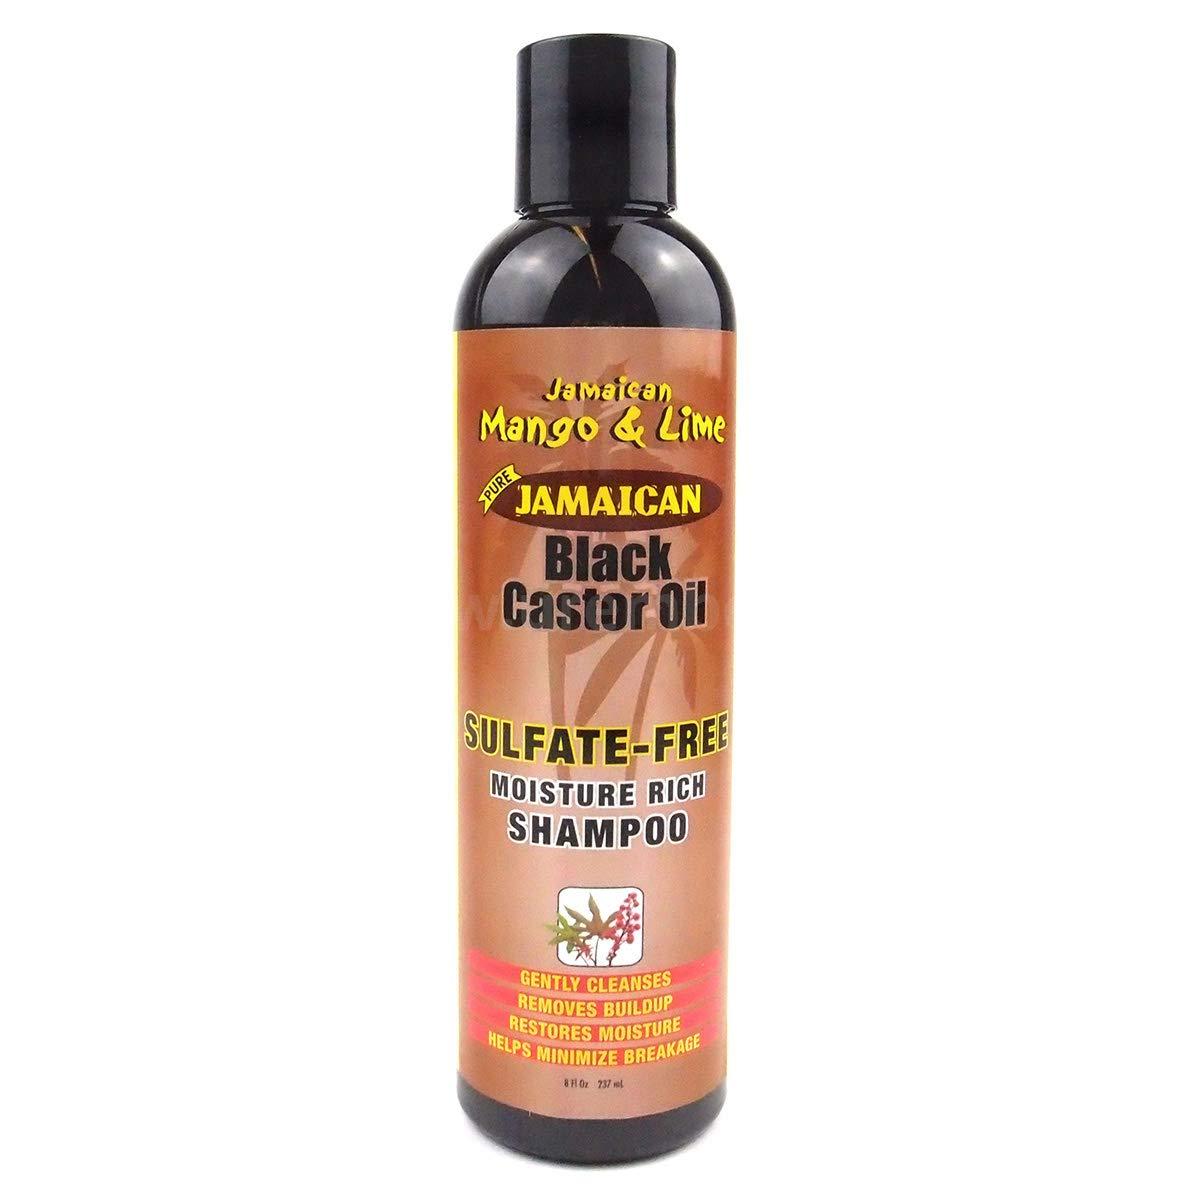 Jamaican Mango & Lime Black Castor Oil Sulfate Free Shampoo 8oz